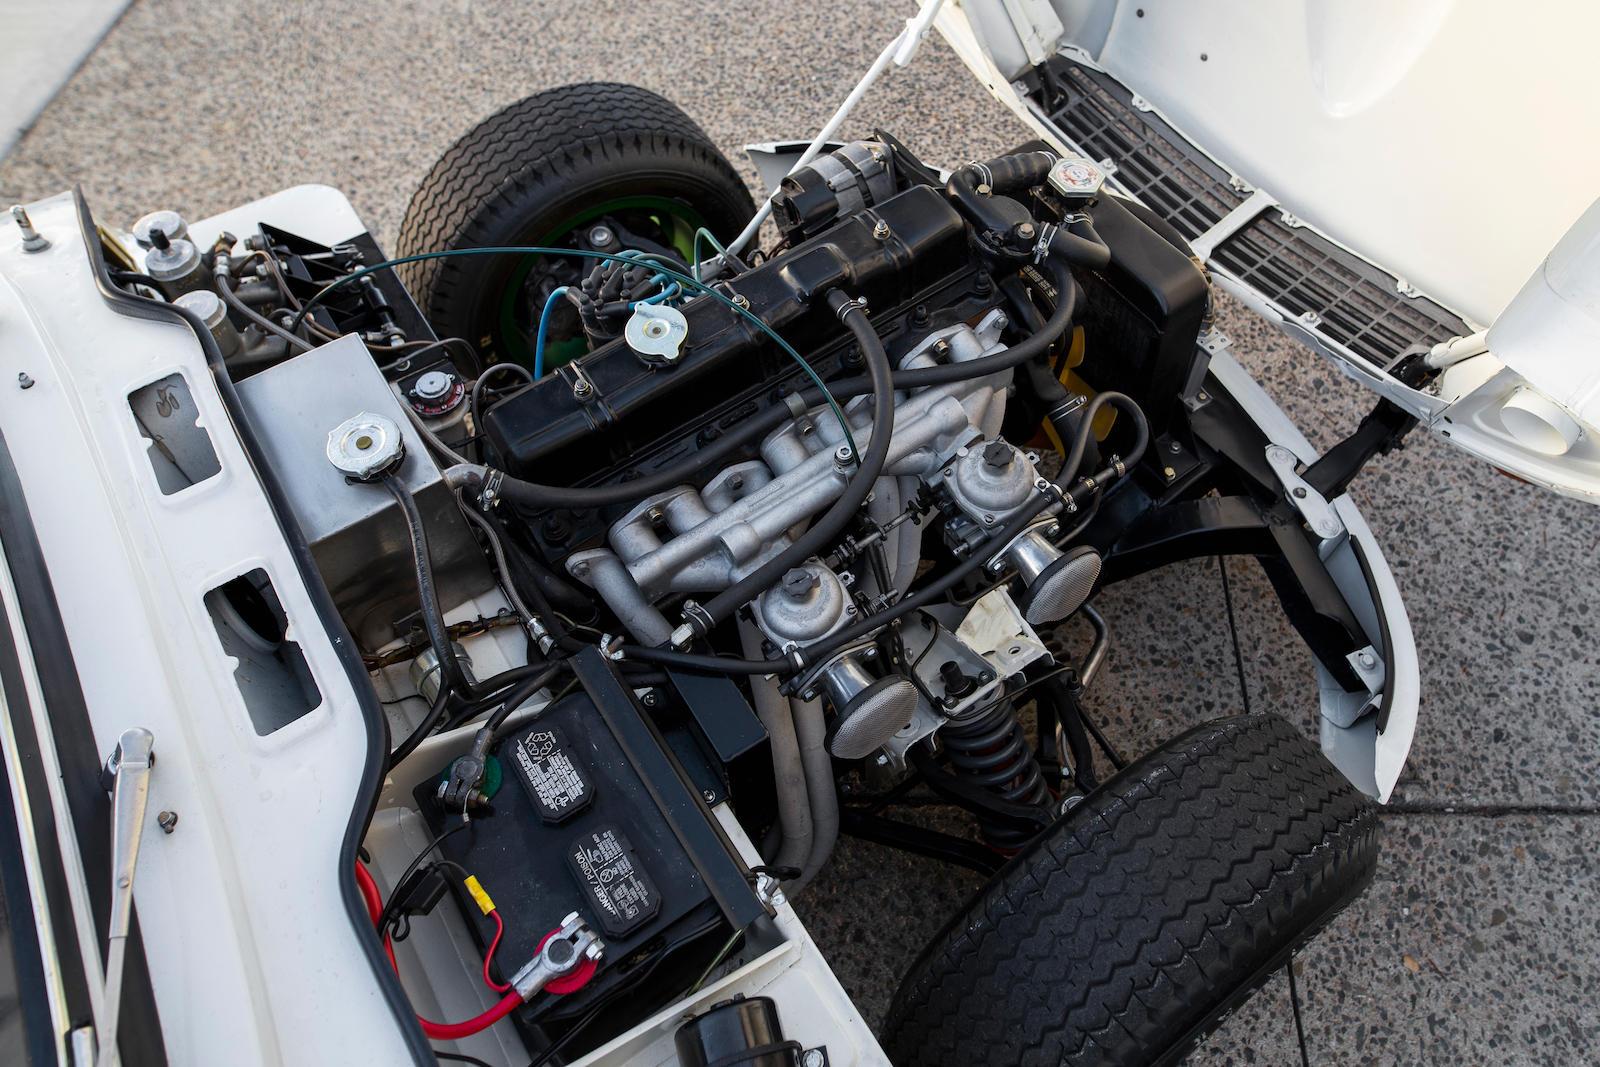 1969 Triumph GT6+ Mk II engine